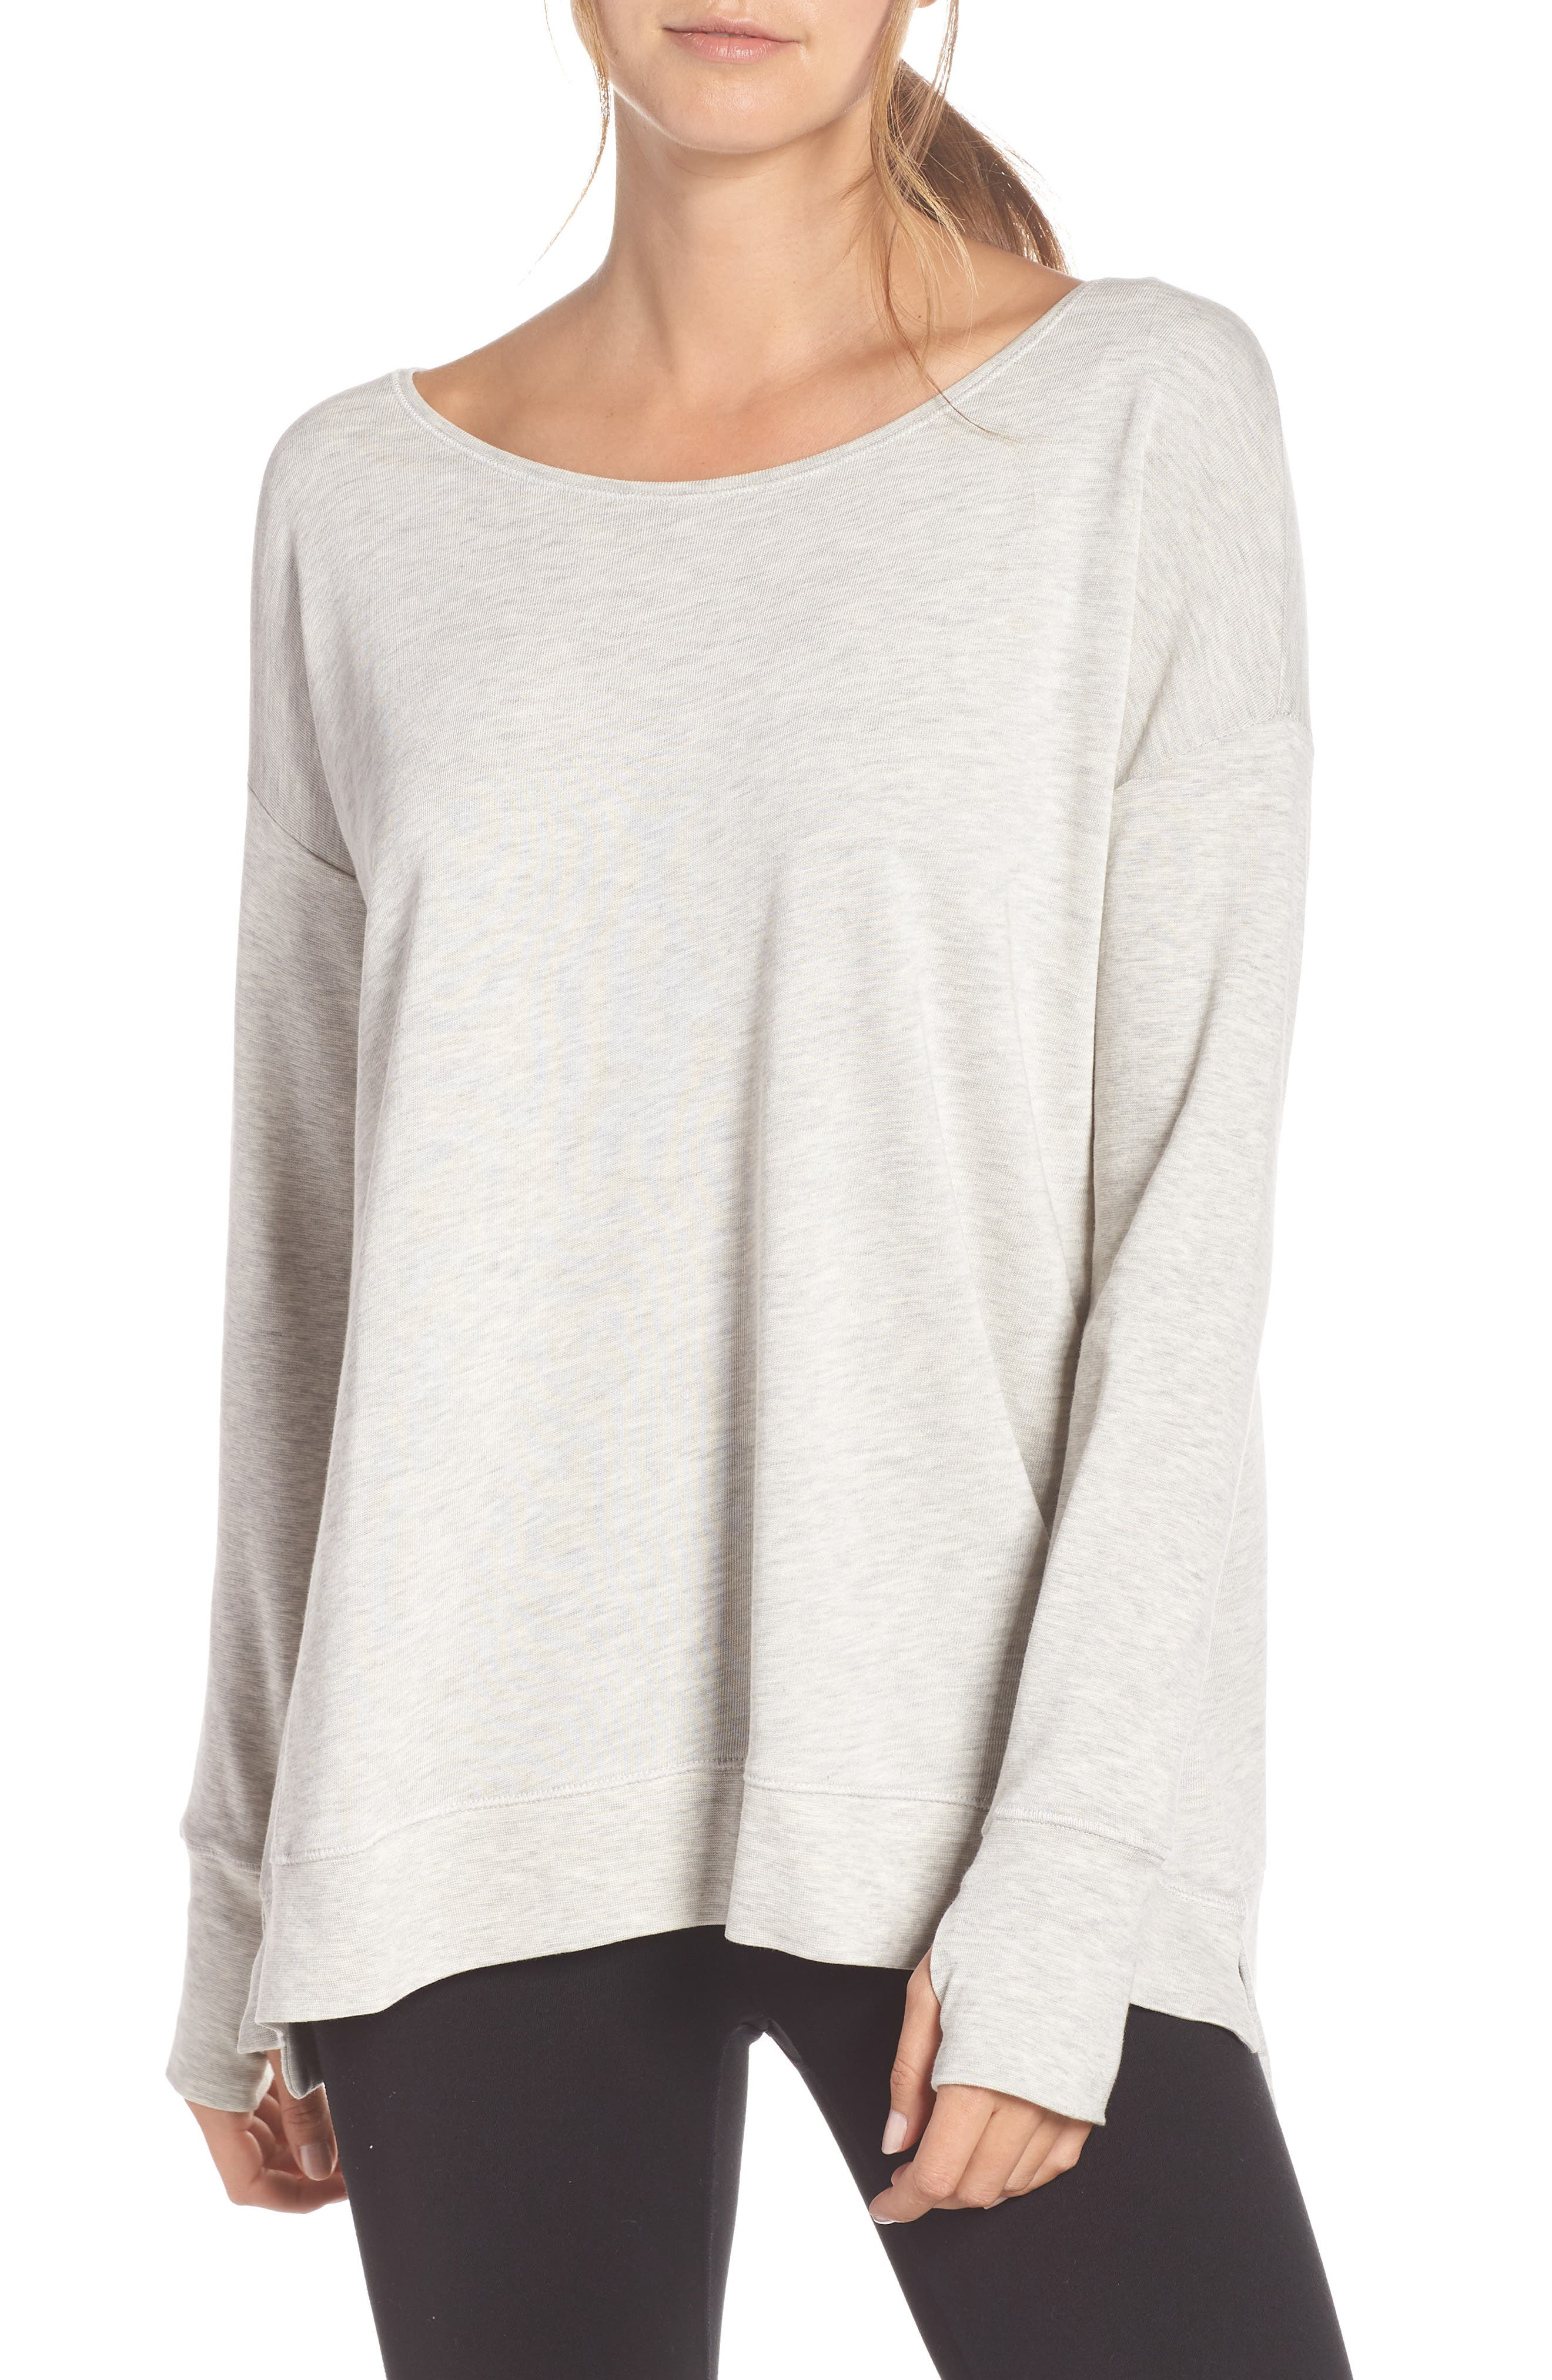 Simhasana Sweatshirt,                         Main,                         color, 250